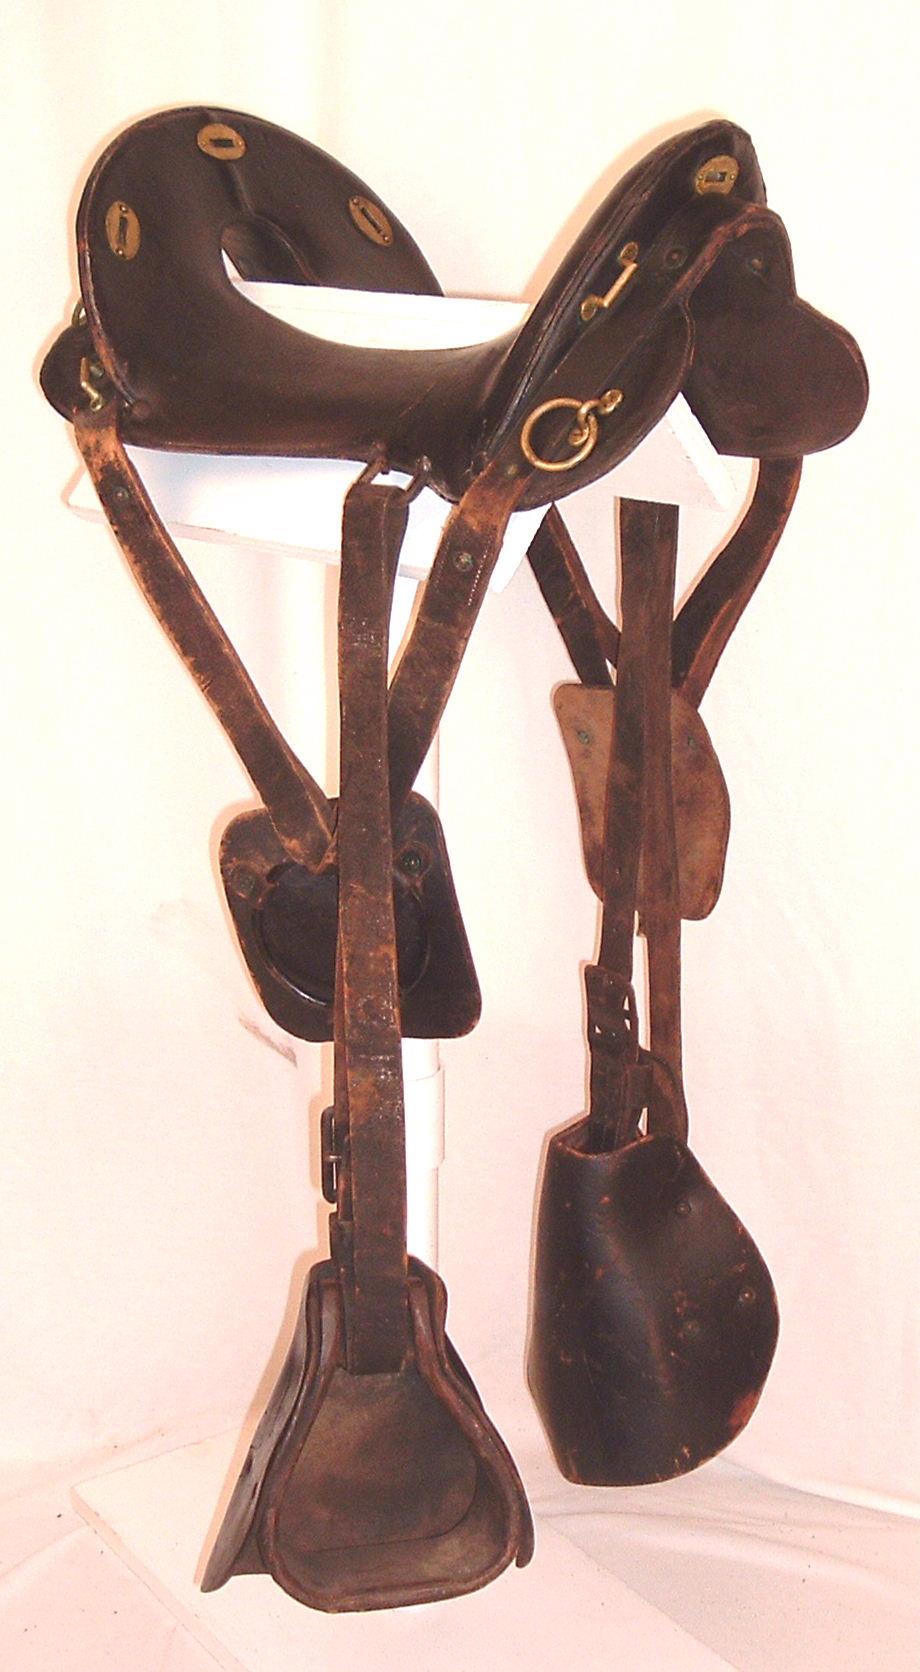 Indian Wars Saddlery – Confederate Saddles & Horse Equipment